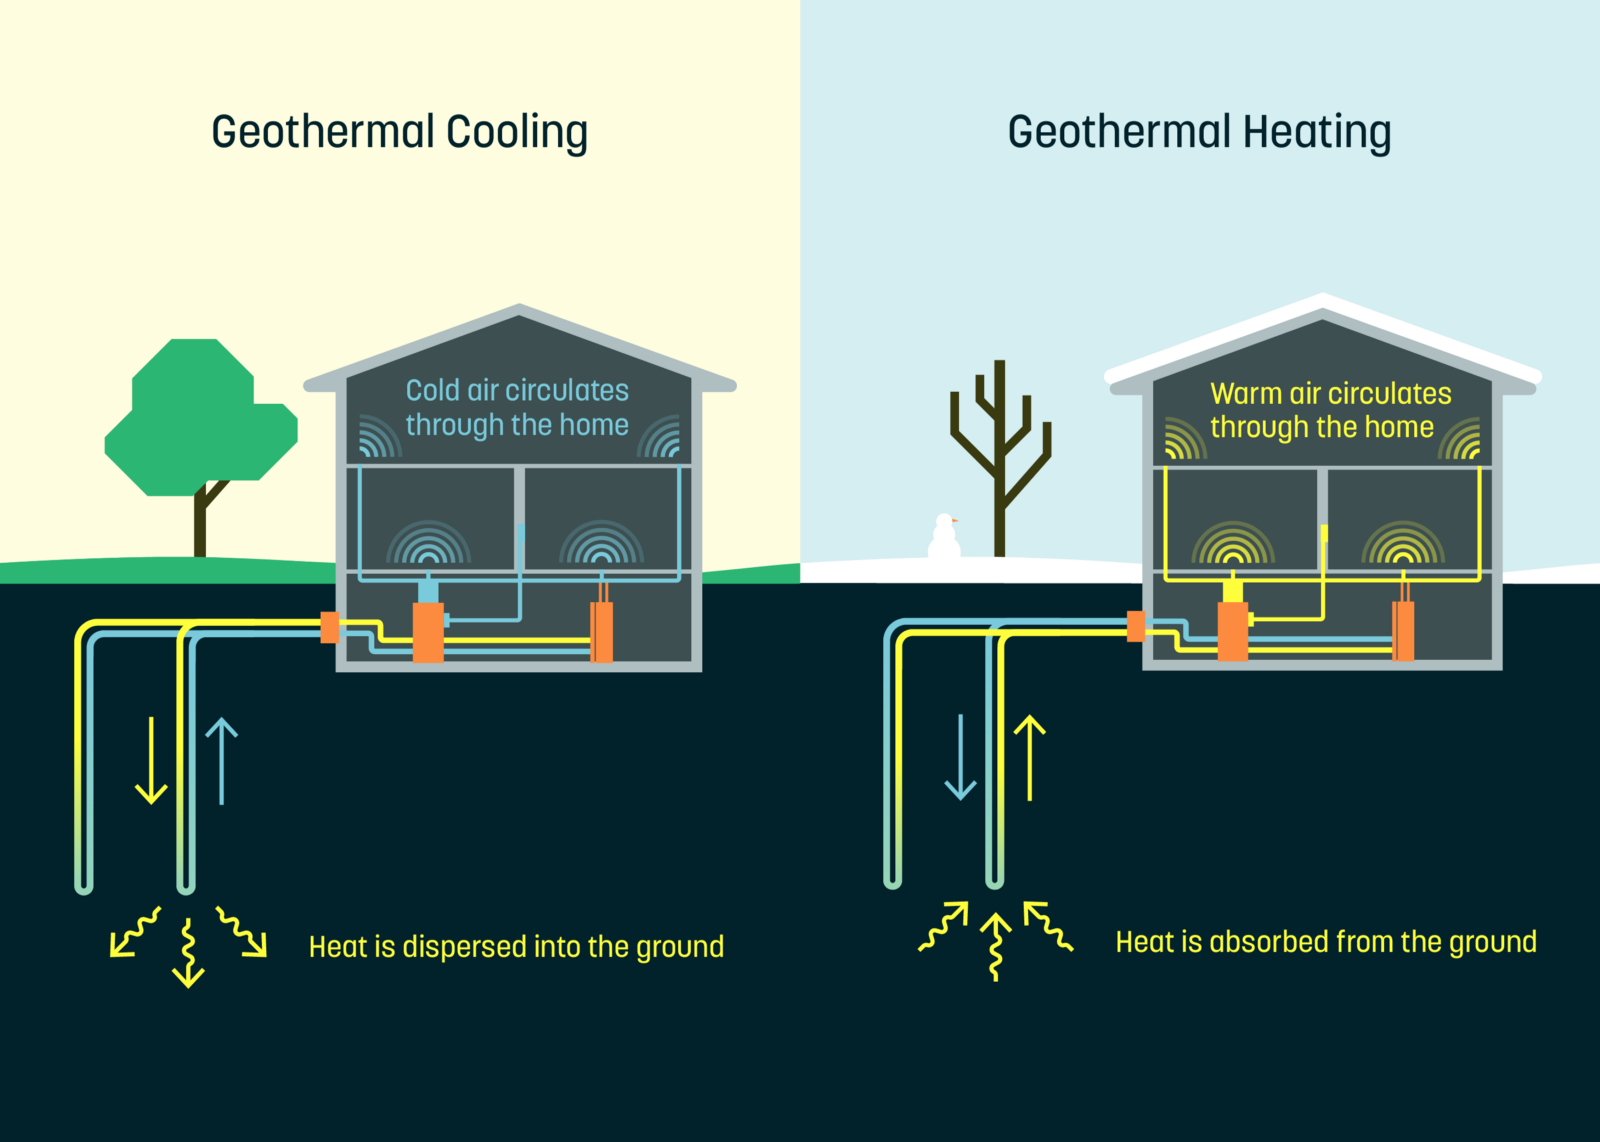 Google Creates Dandelion To Promote Geothermal Energy